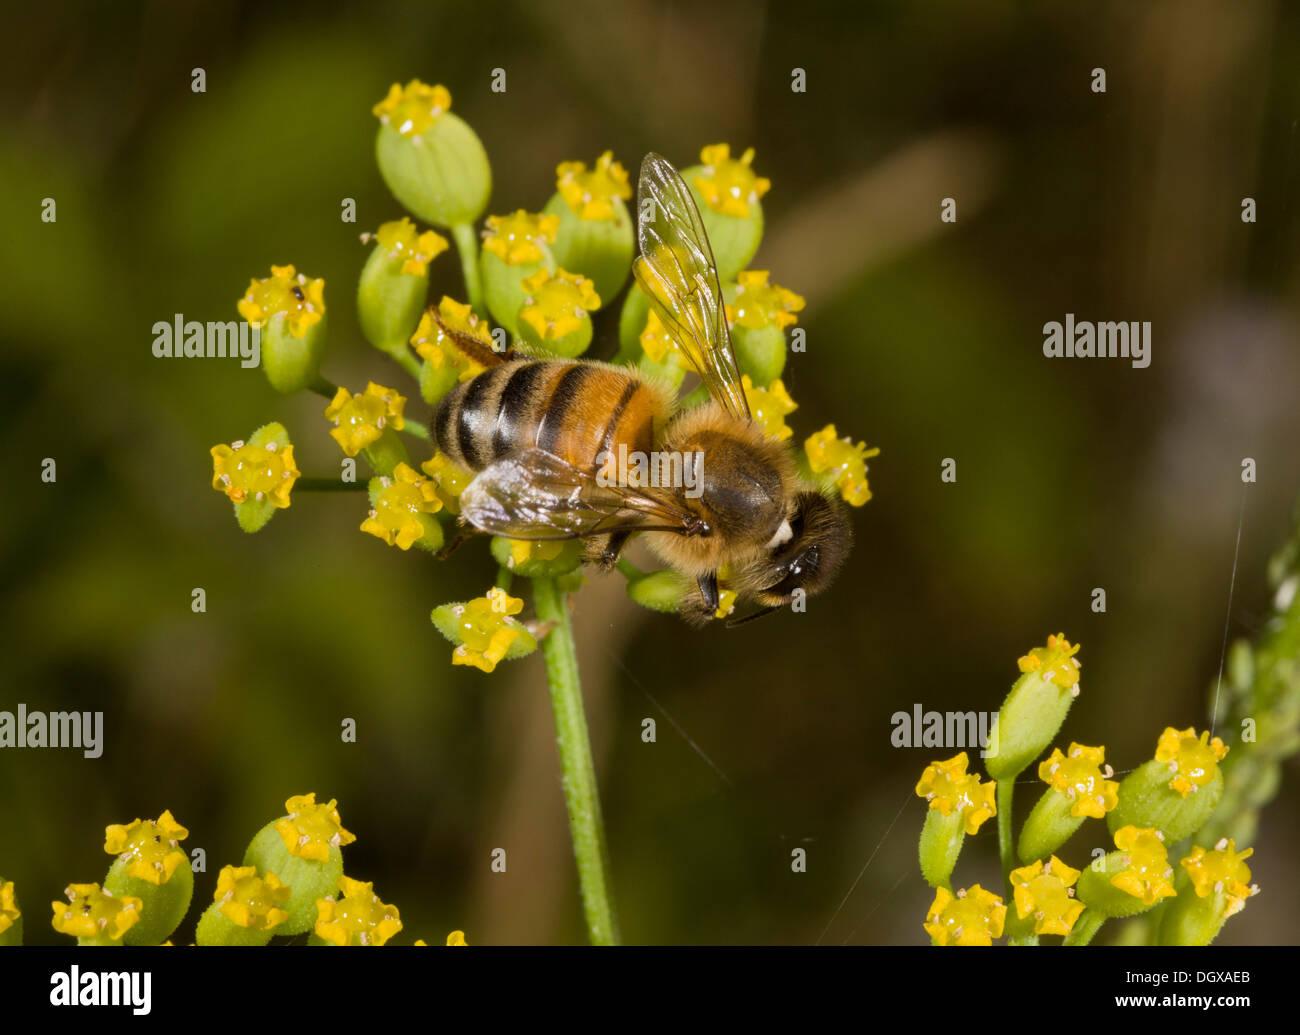 Honey Bee, Apis mellifera nectaring on Wild Parsnip. - Stock Image